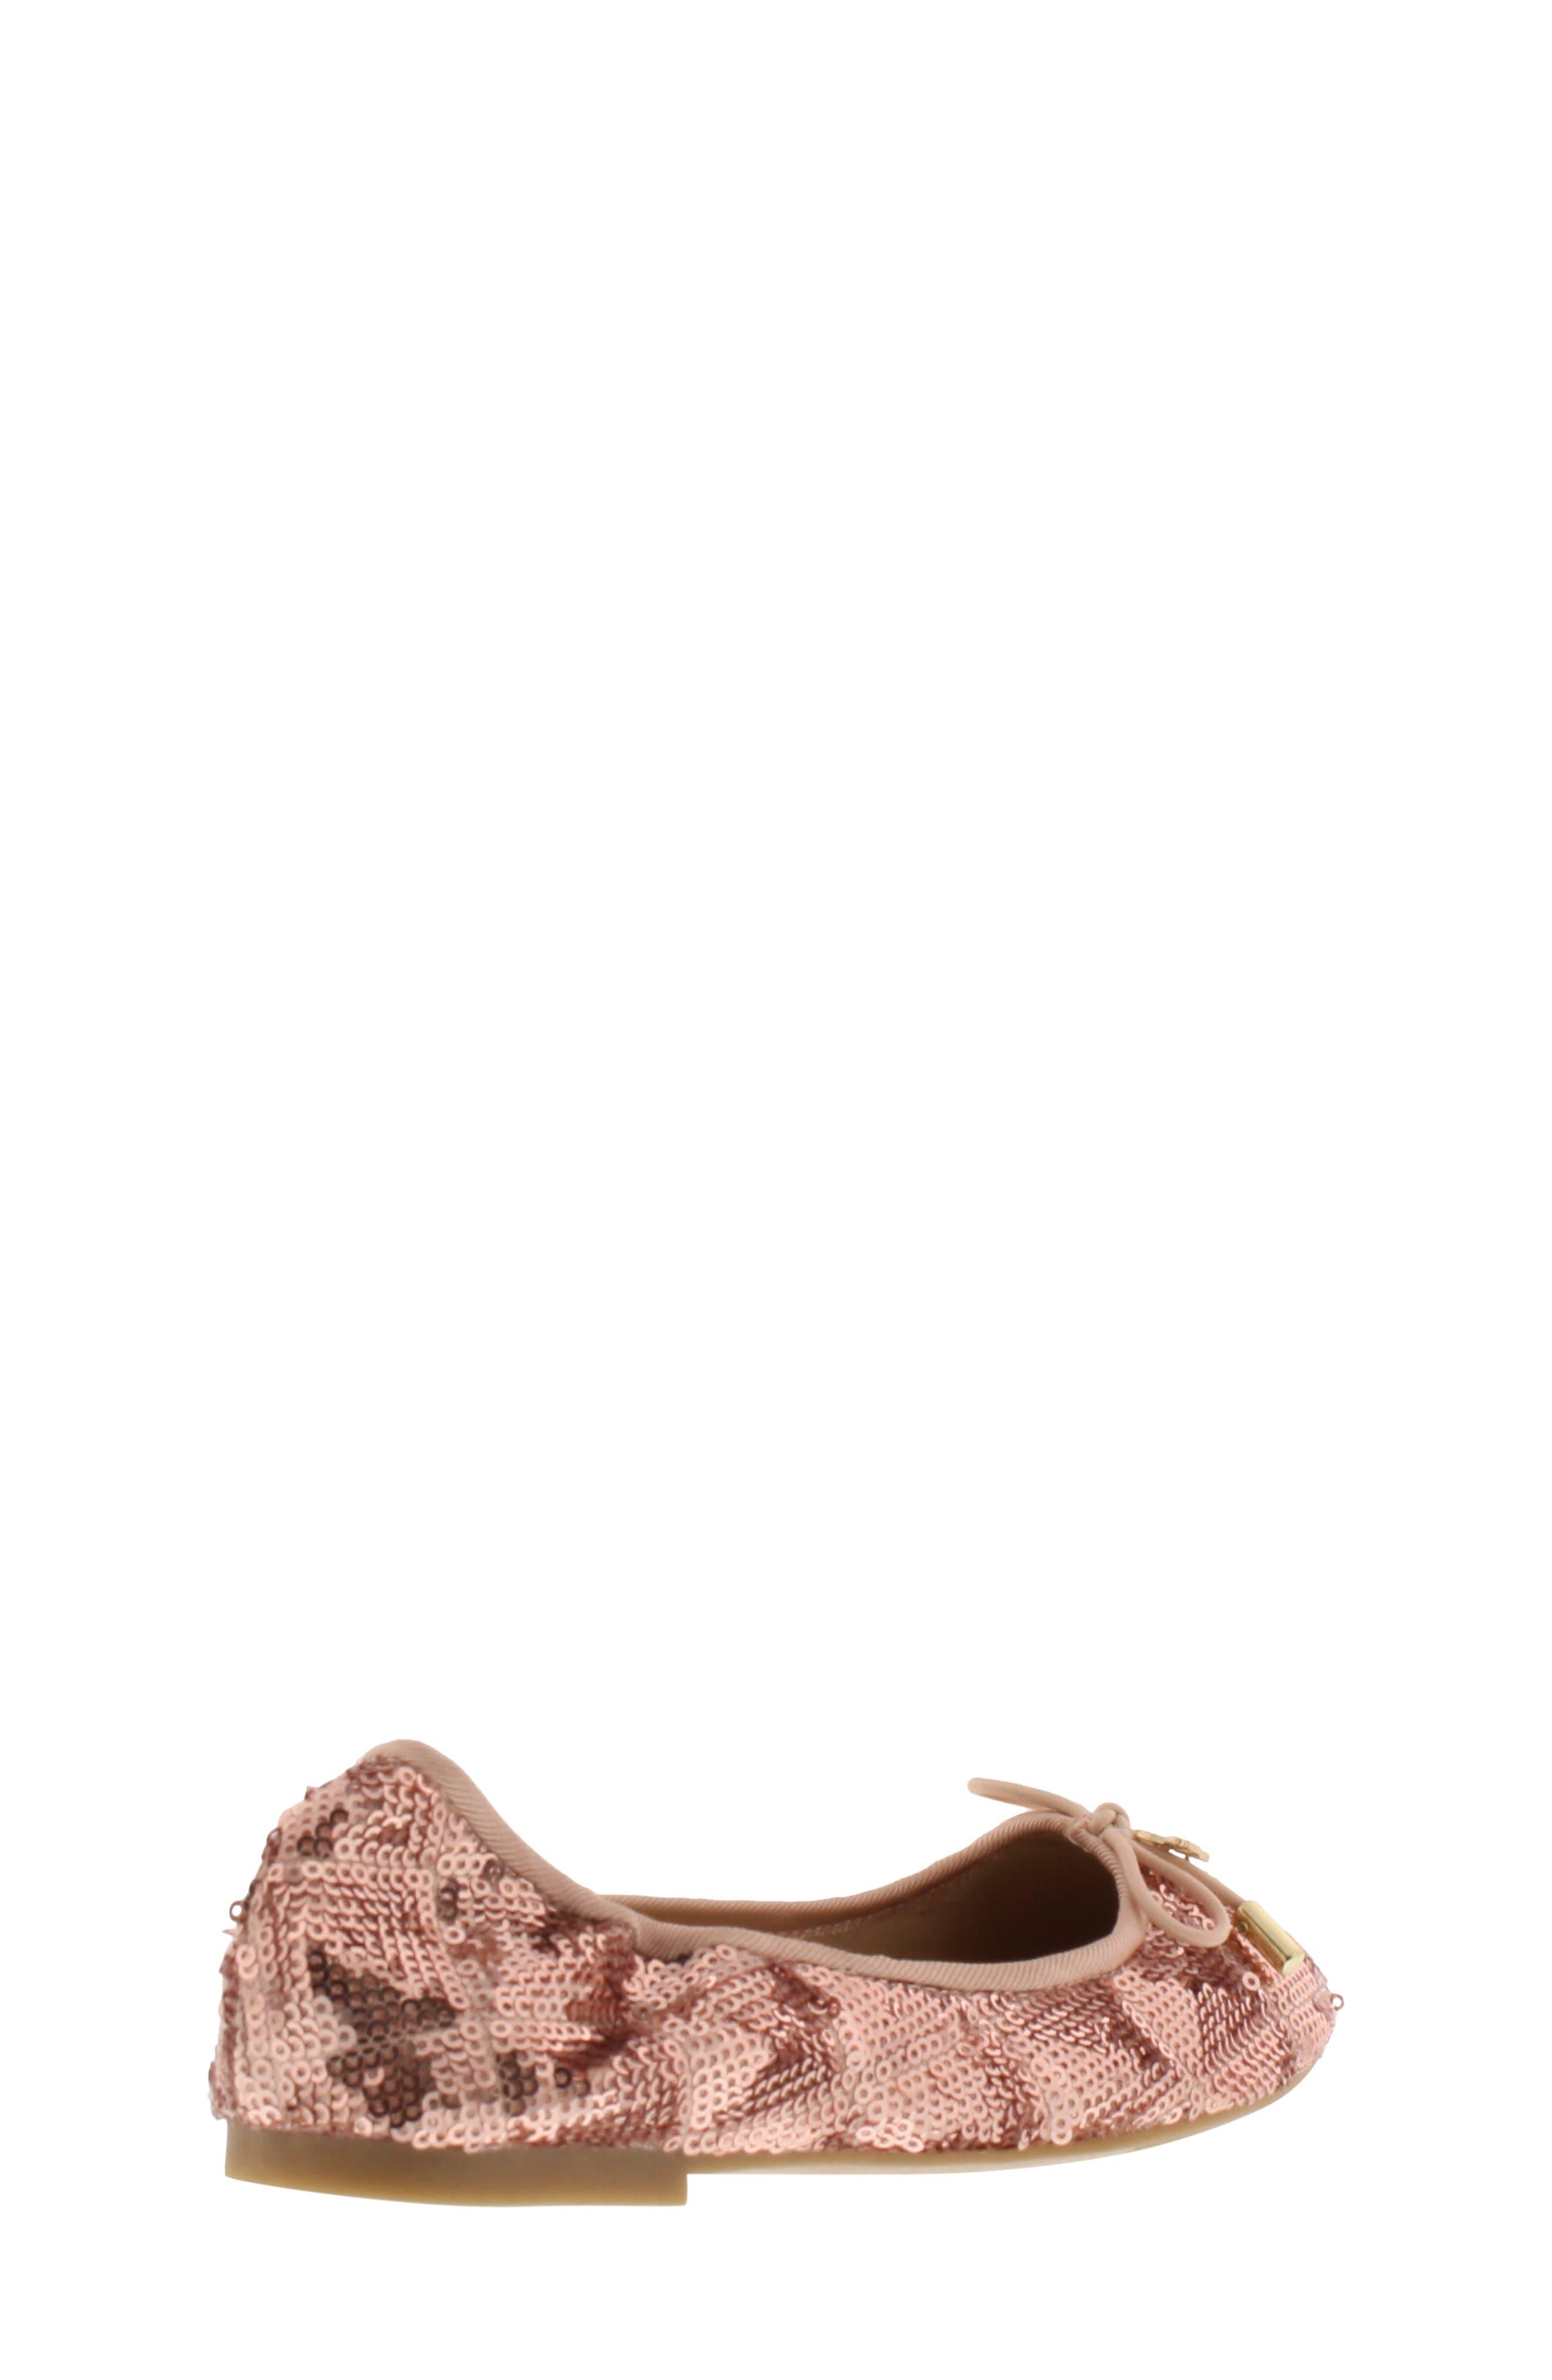 SAM EDELMAN, Felicia Sequin Ballet Flat, Alternate thumbnail 2, color, ROSE GOLD